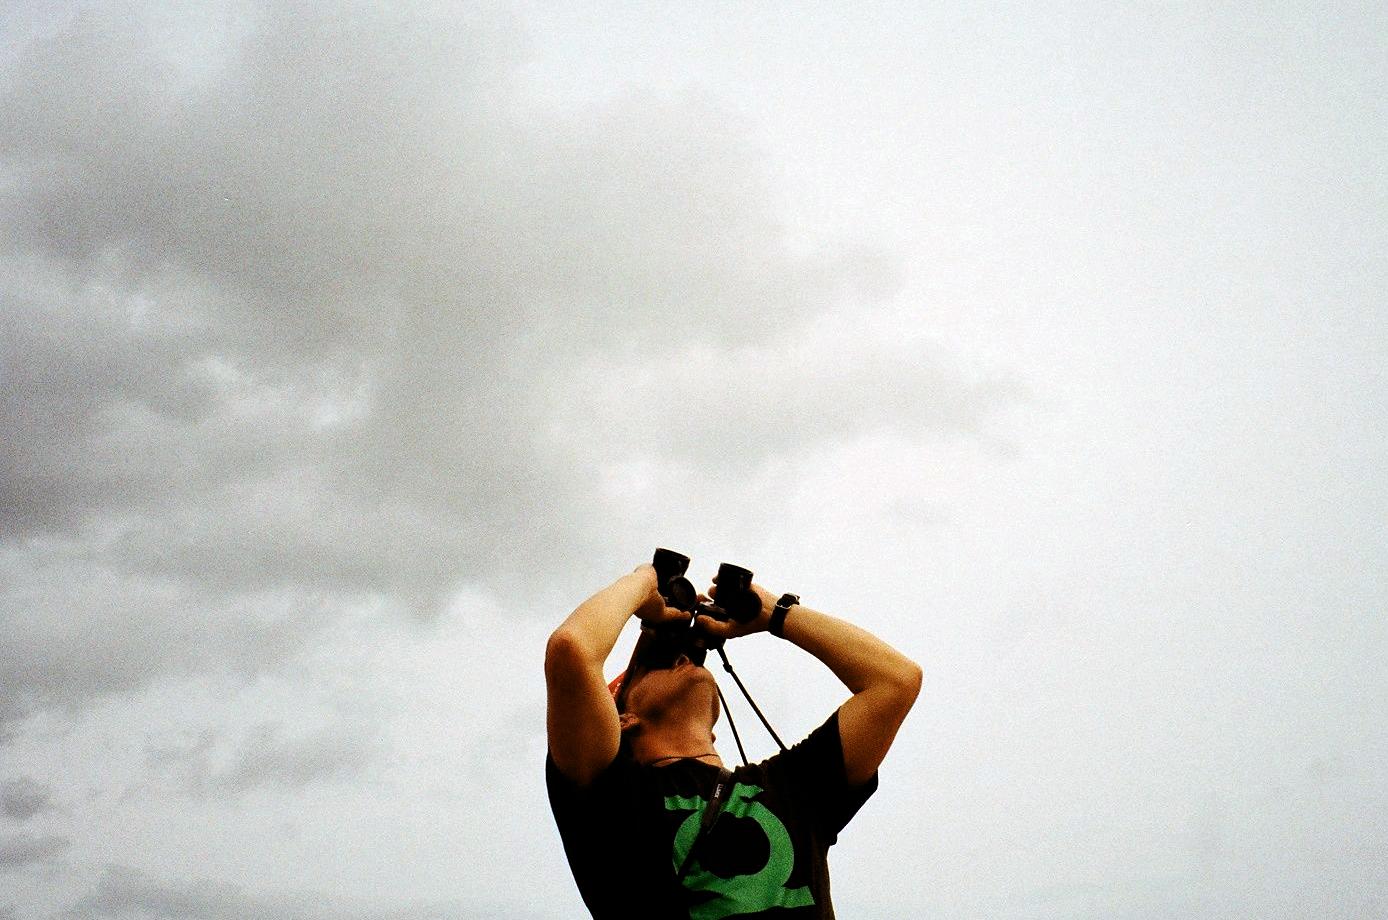 Binoculars-Bounremouth.jpg